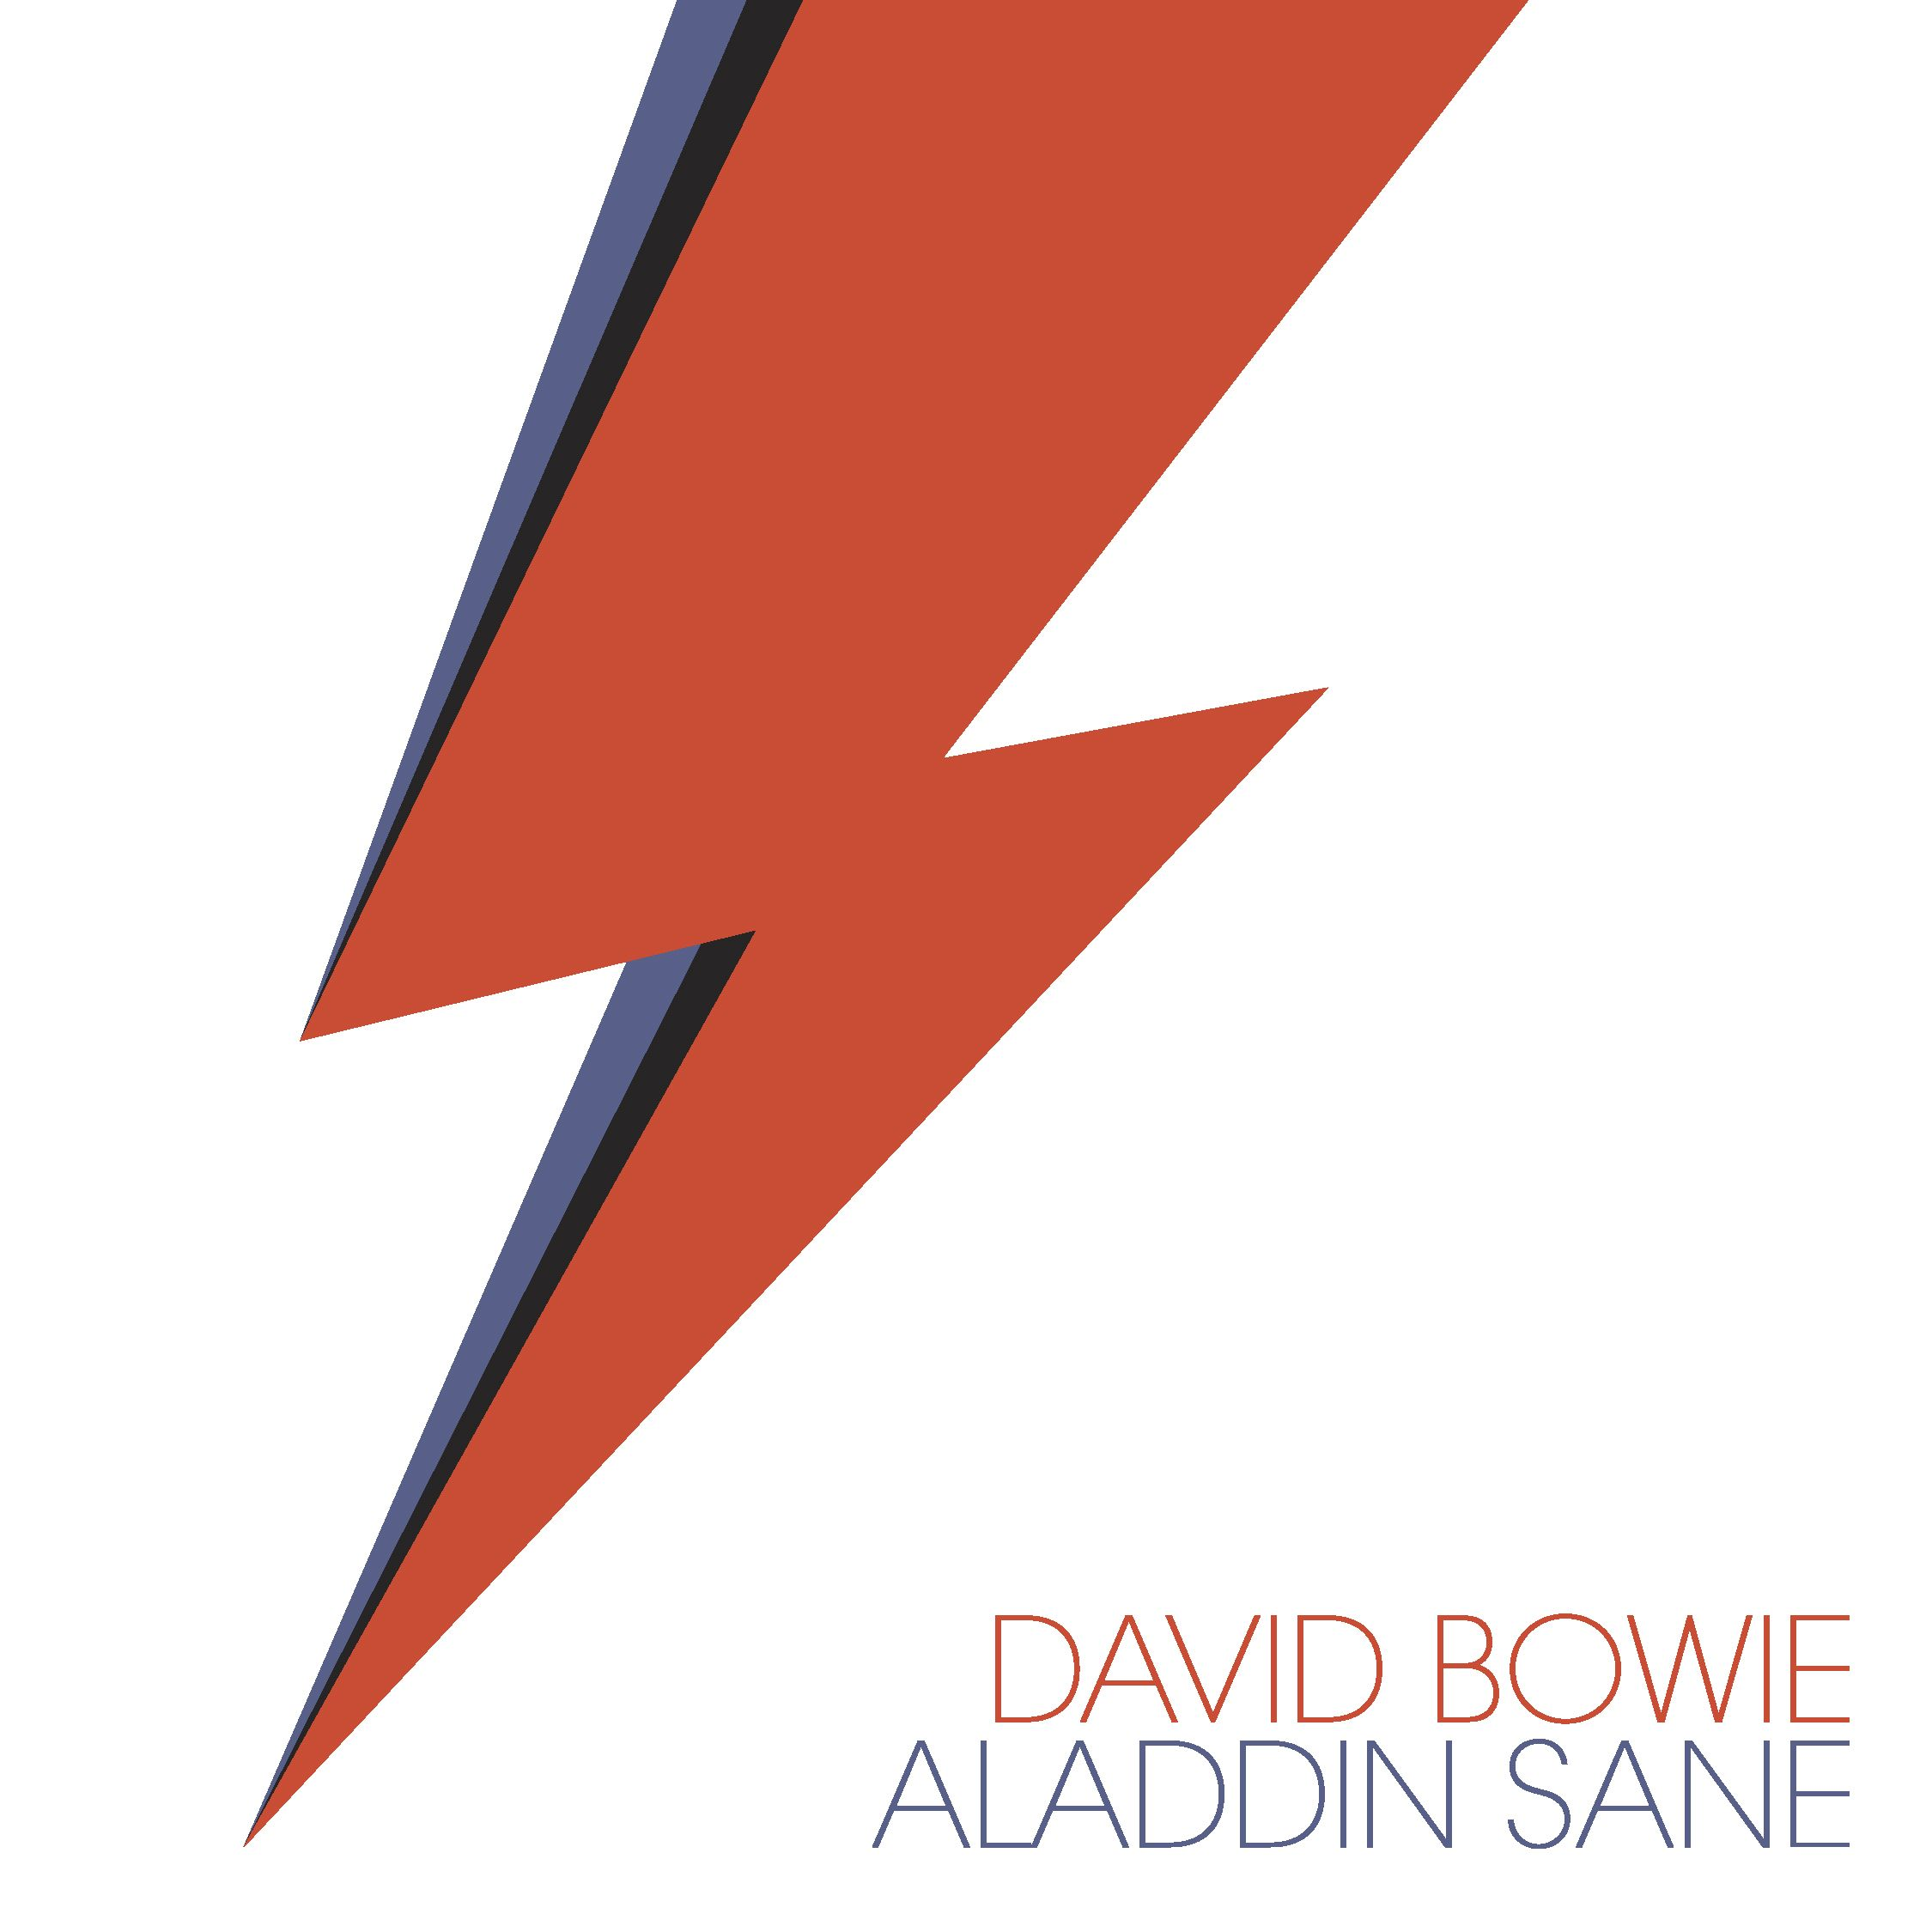 https://s-media-cache-ak0.pinimg.com/originals/0a/fc/ee/0afceed4f425fc2d10d3280052028caf.jpg David Bowie Lightning Bolt Vector